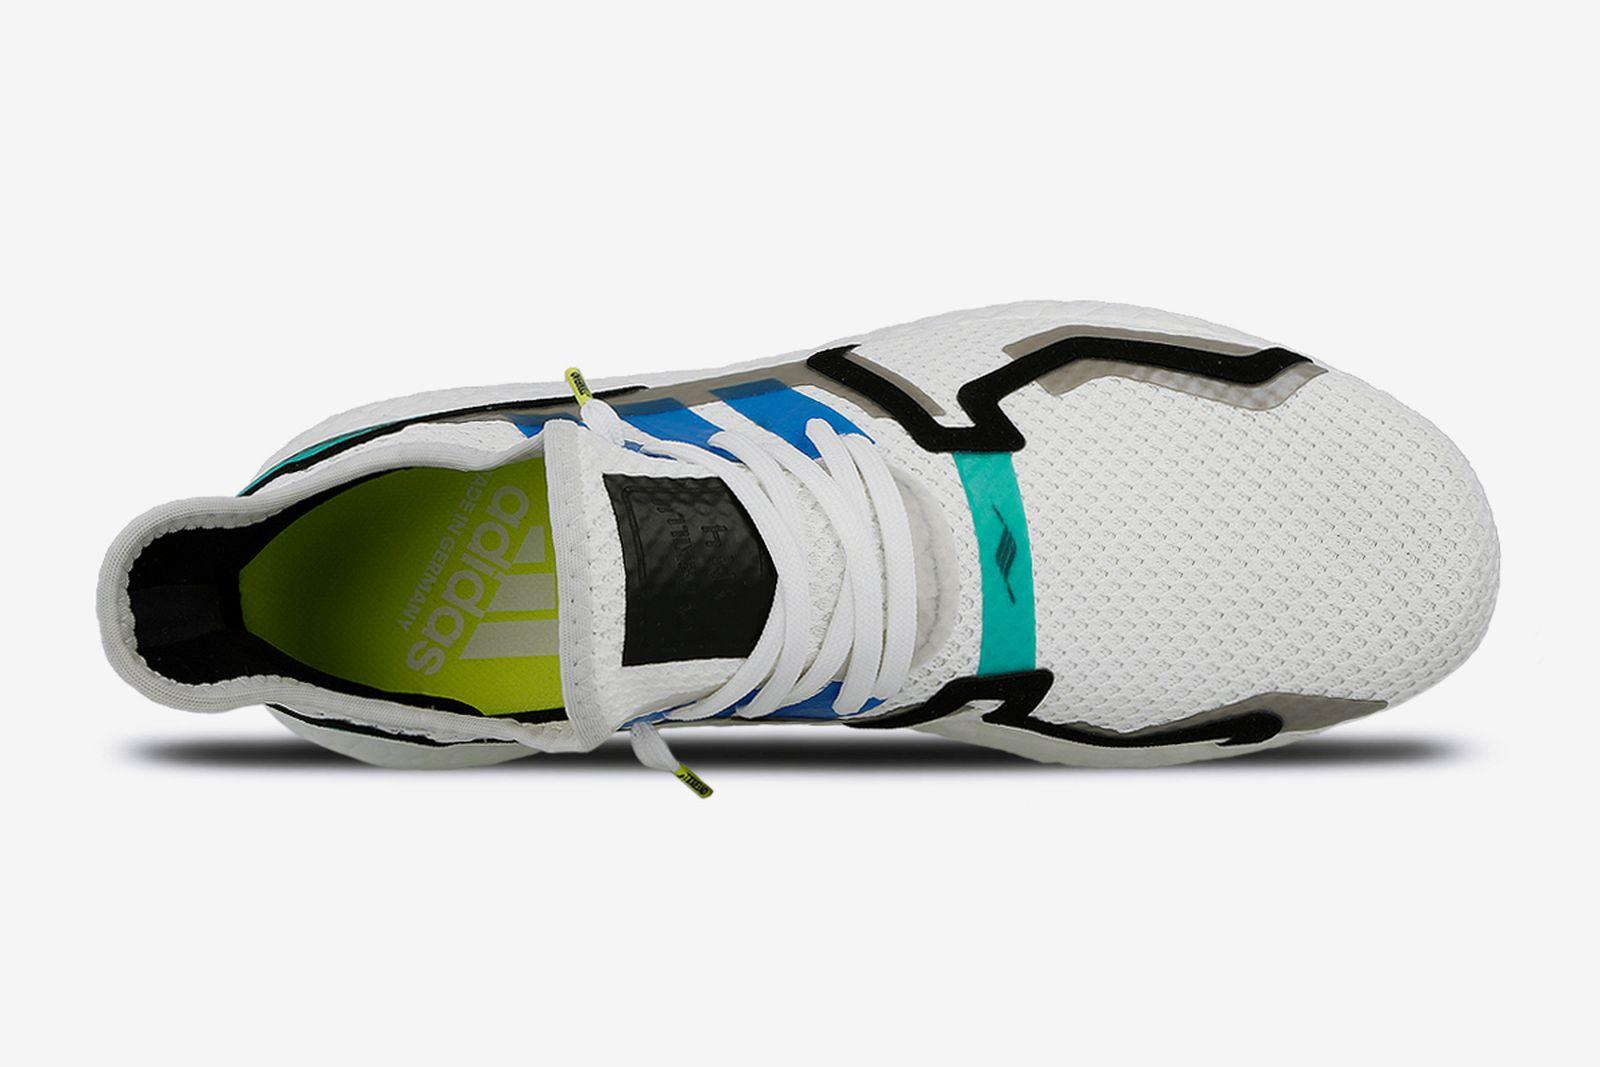 overkill adidas speedfactory am4 release date price